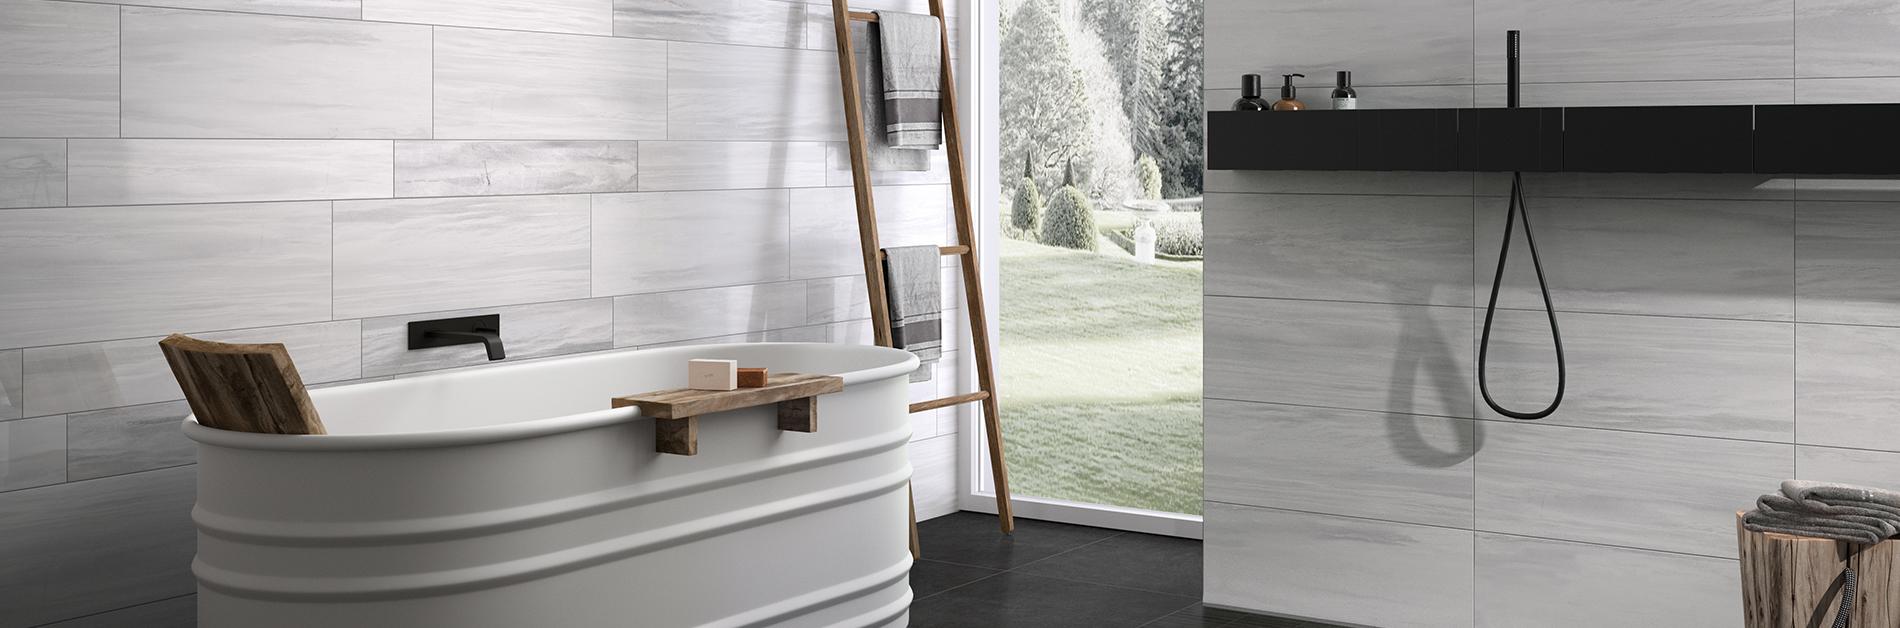 entdecken sie unser umfangreiches fliesensortiment fliesenland oberhausen. Black Bedroom Furniture Sets. Home Design Ideas